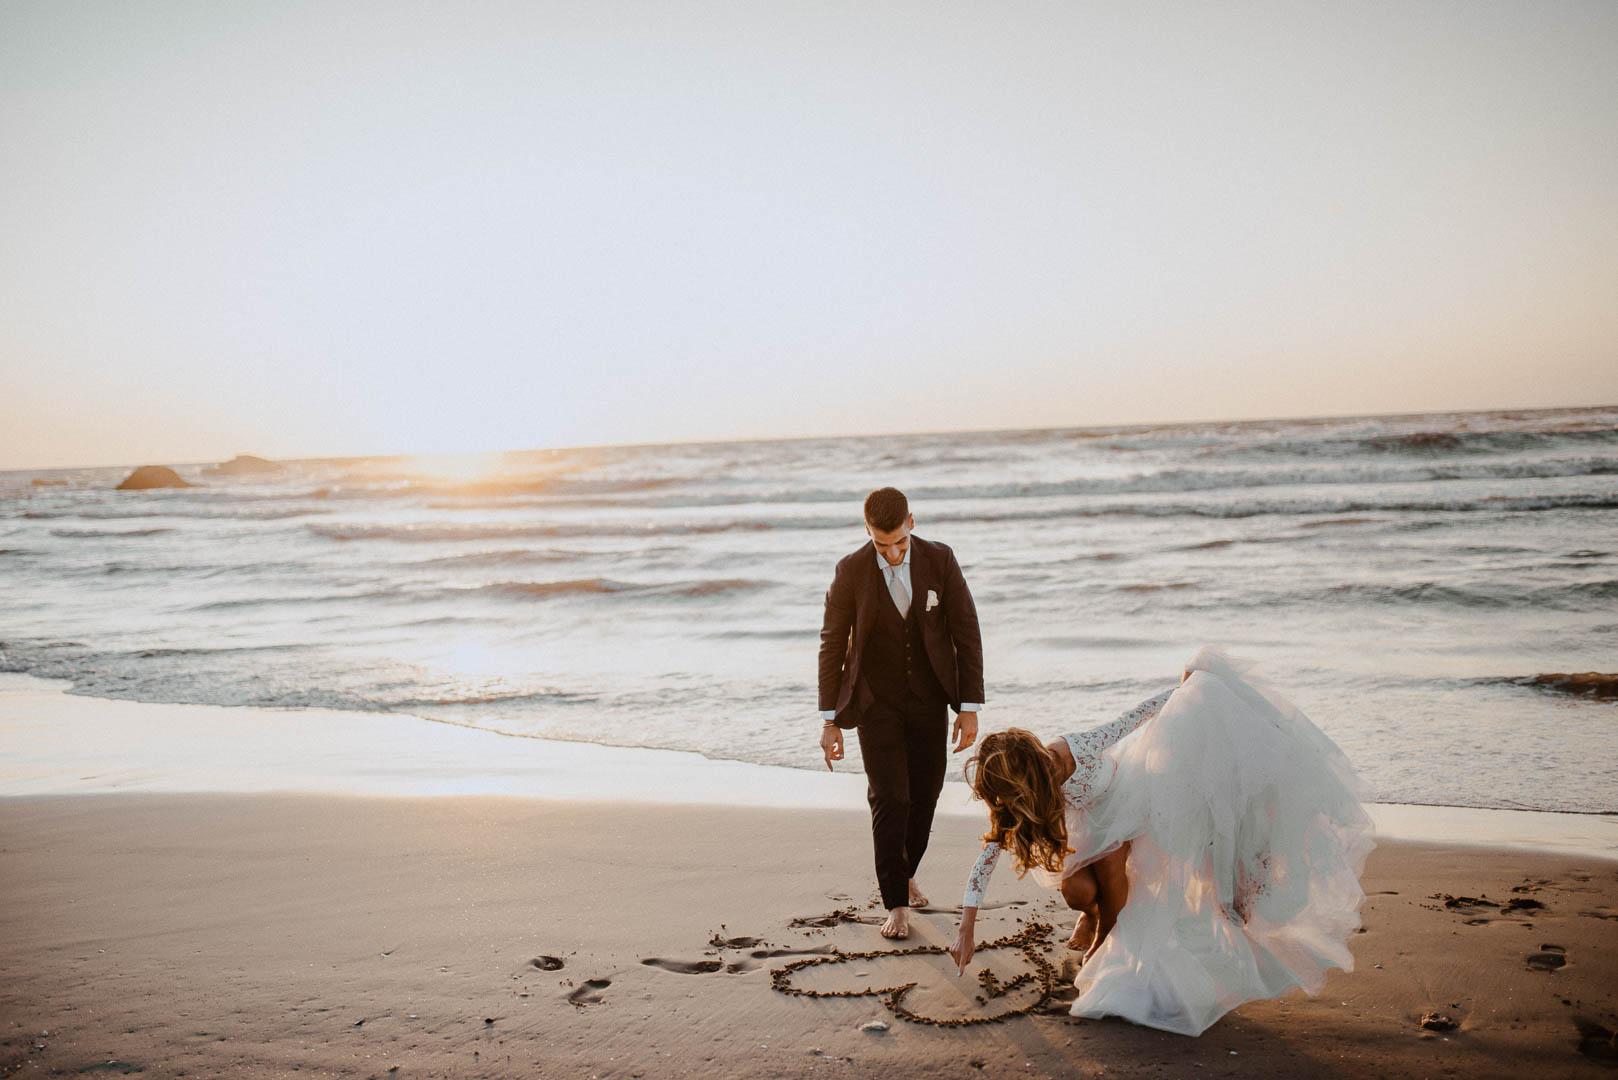 wedding-photographer-destination-fineart-bespoke-reportage-napoli-nabilah-vivianeizzo-spazio46-126